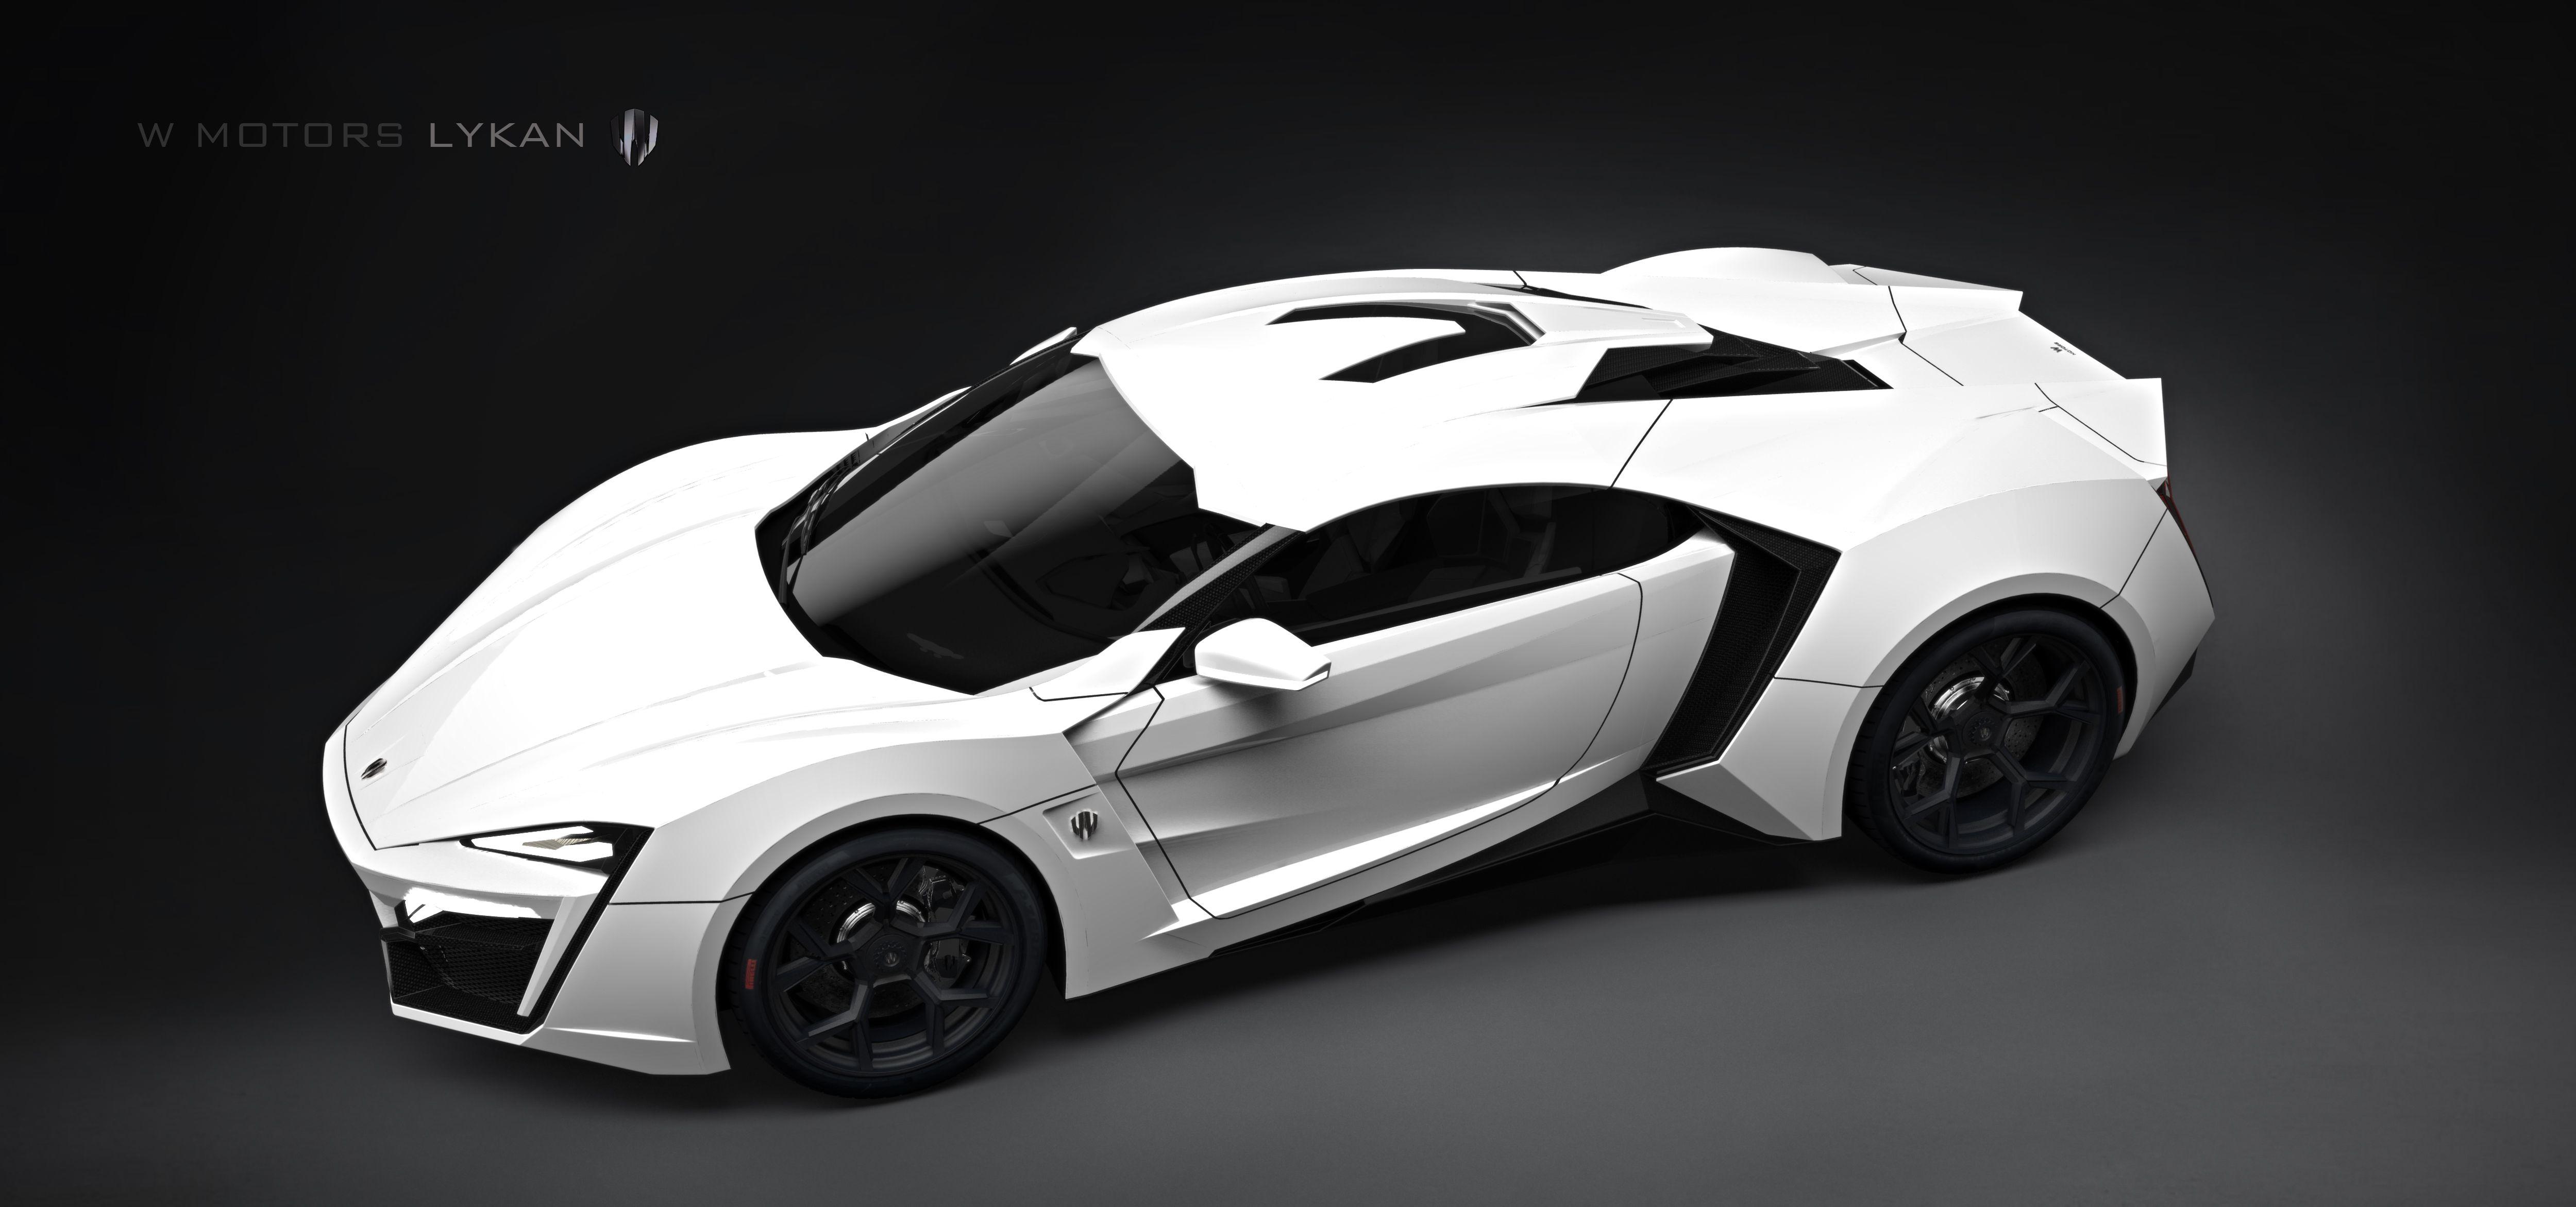 W Motors - HyperSport Lykan White